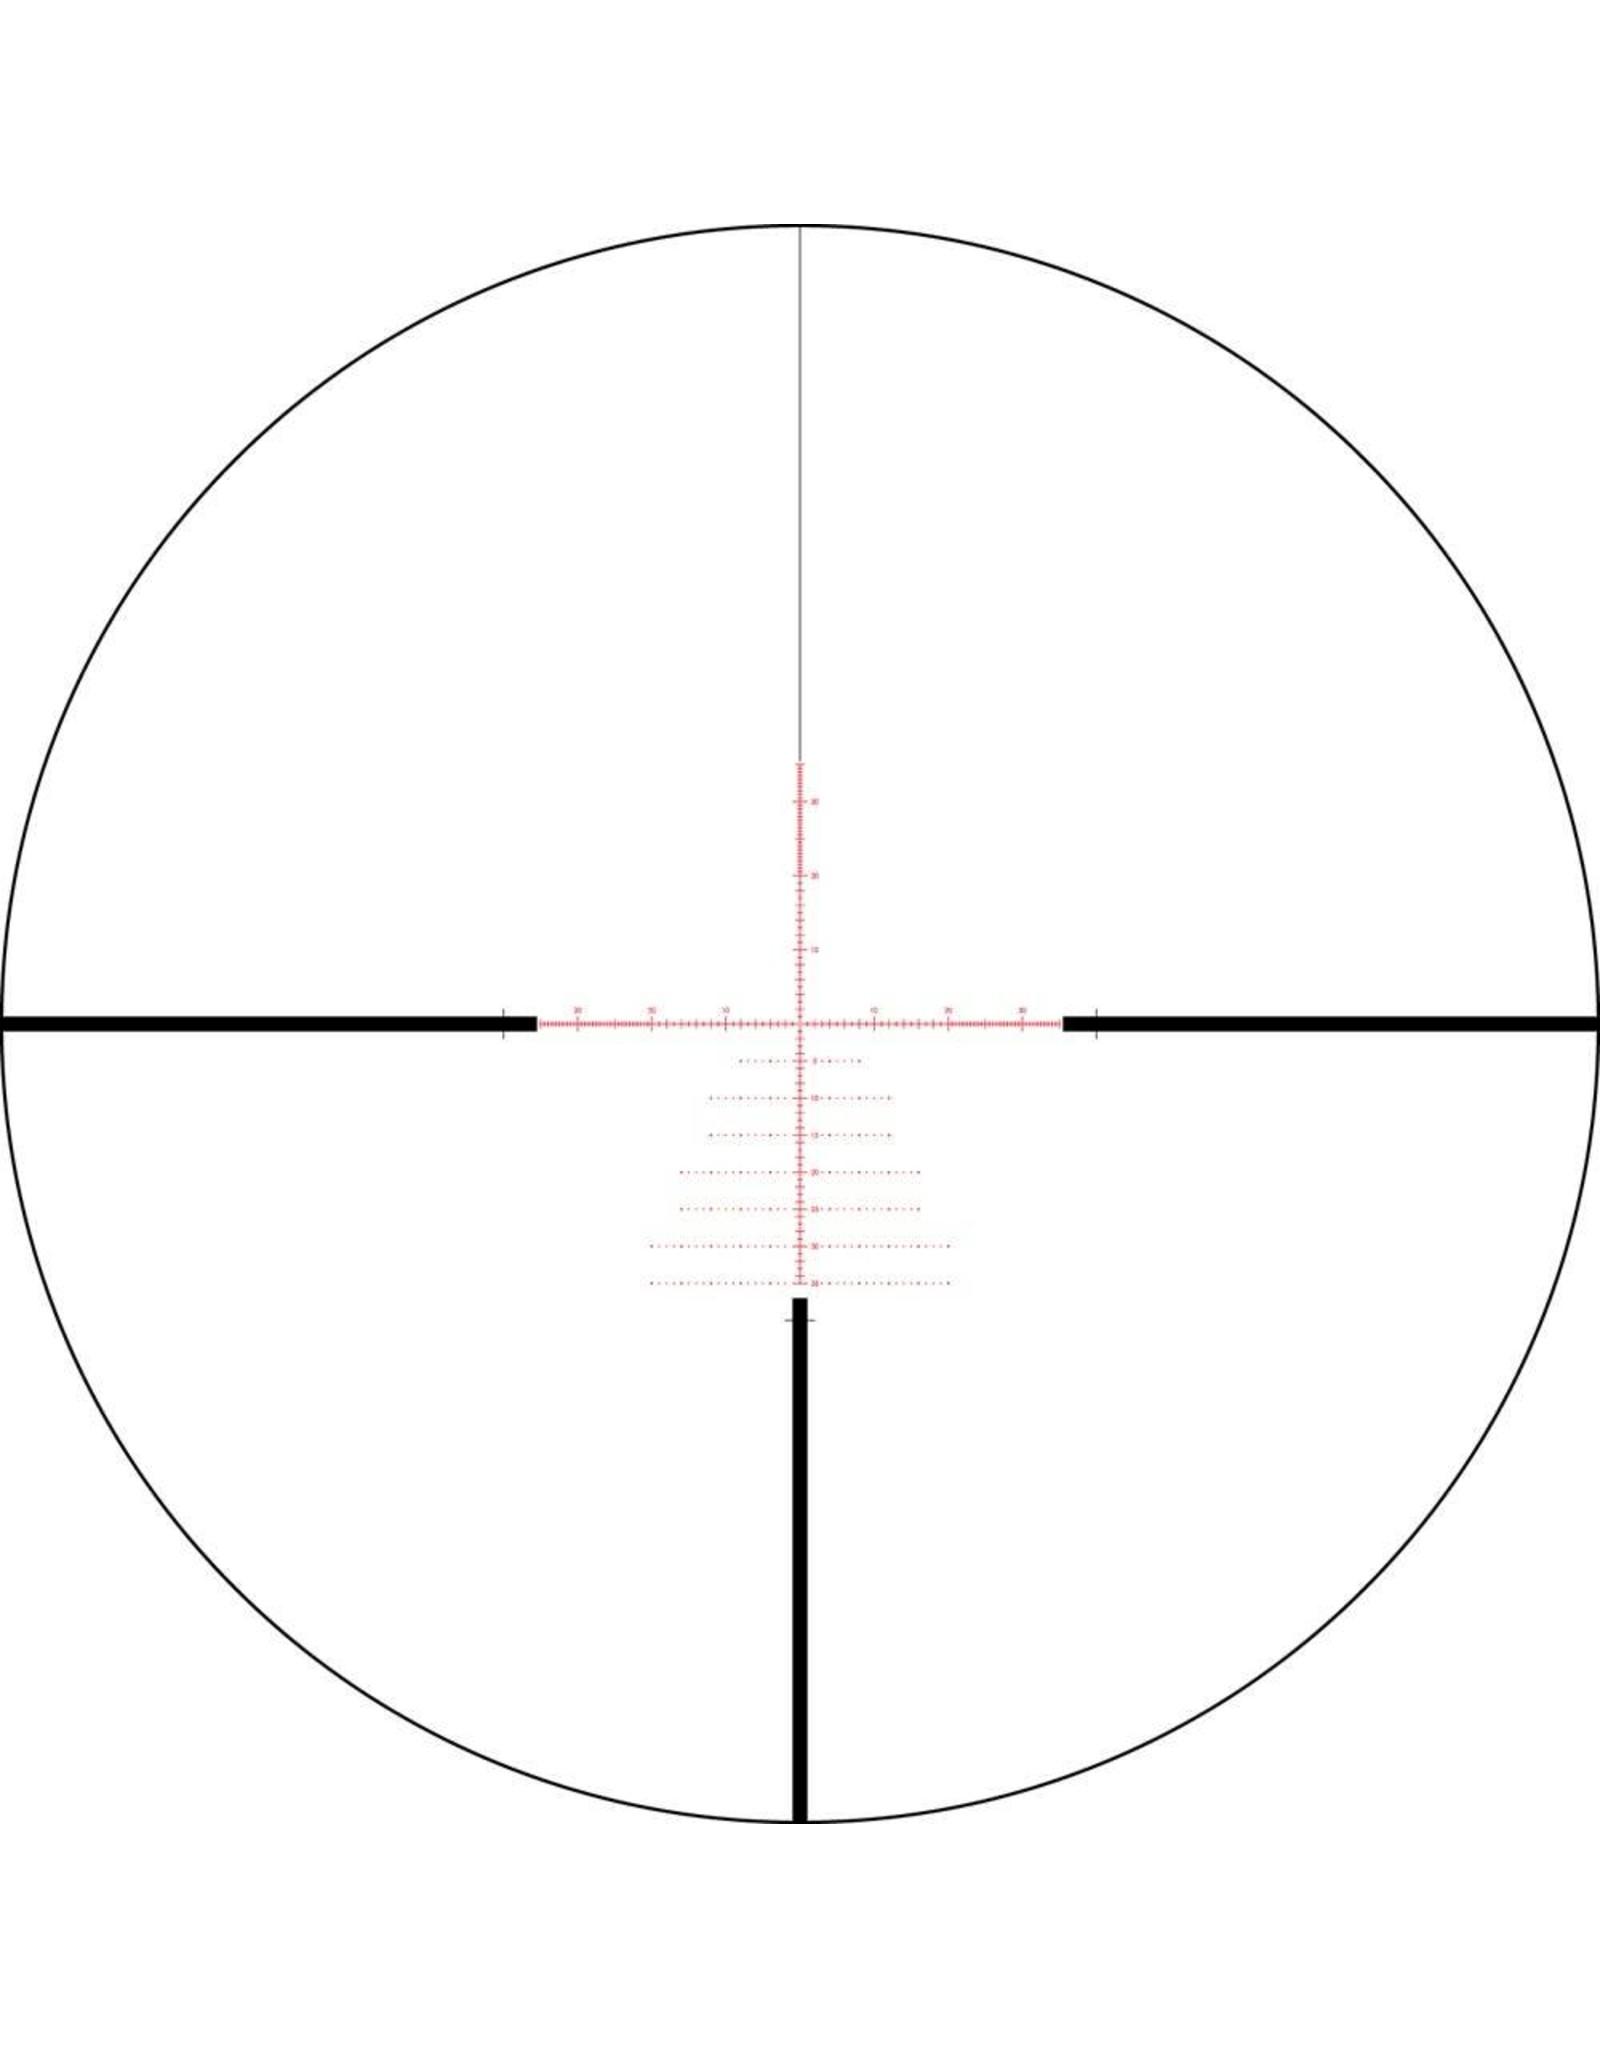 Vortex Vortex Razor HD Gen II 4.5-27x56 FFP EBR-2C (25 MOA)